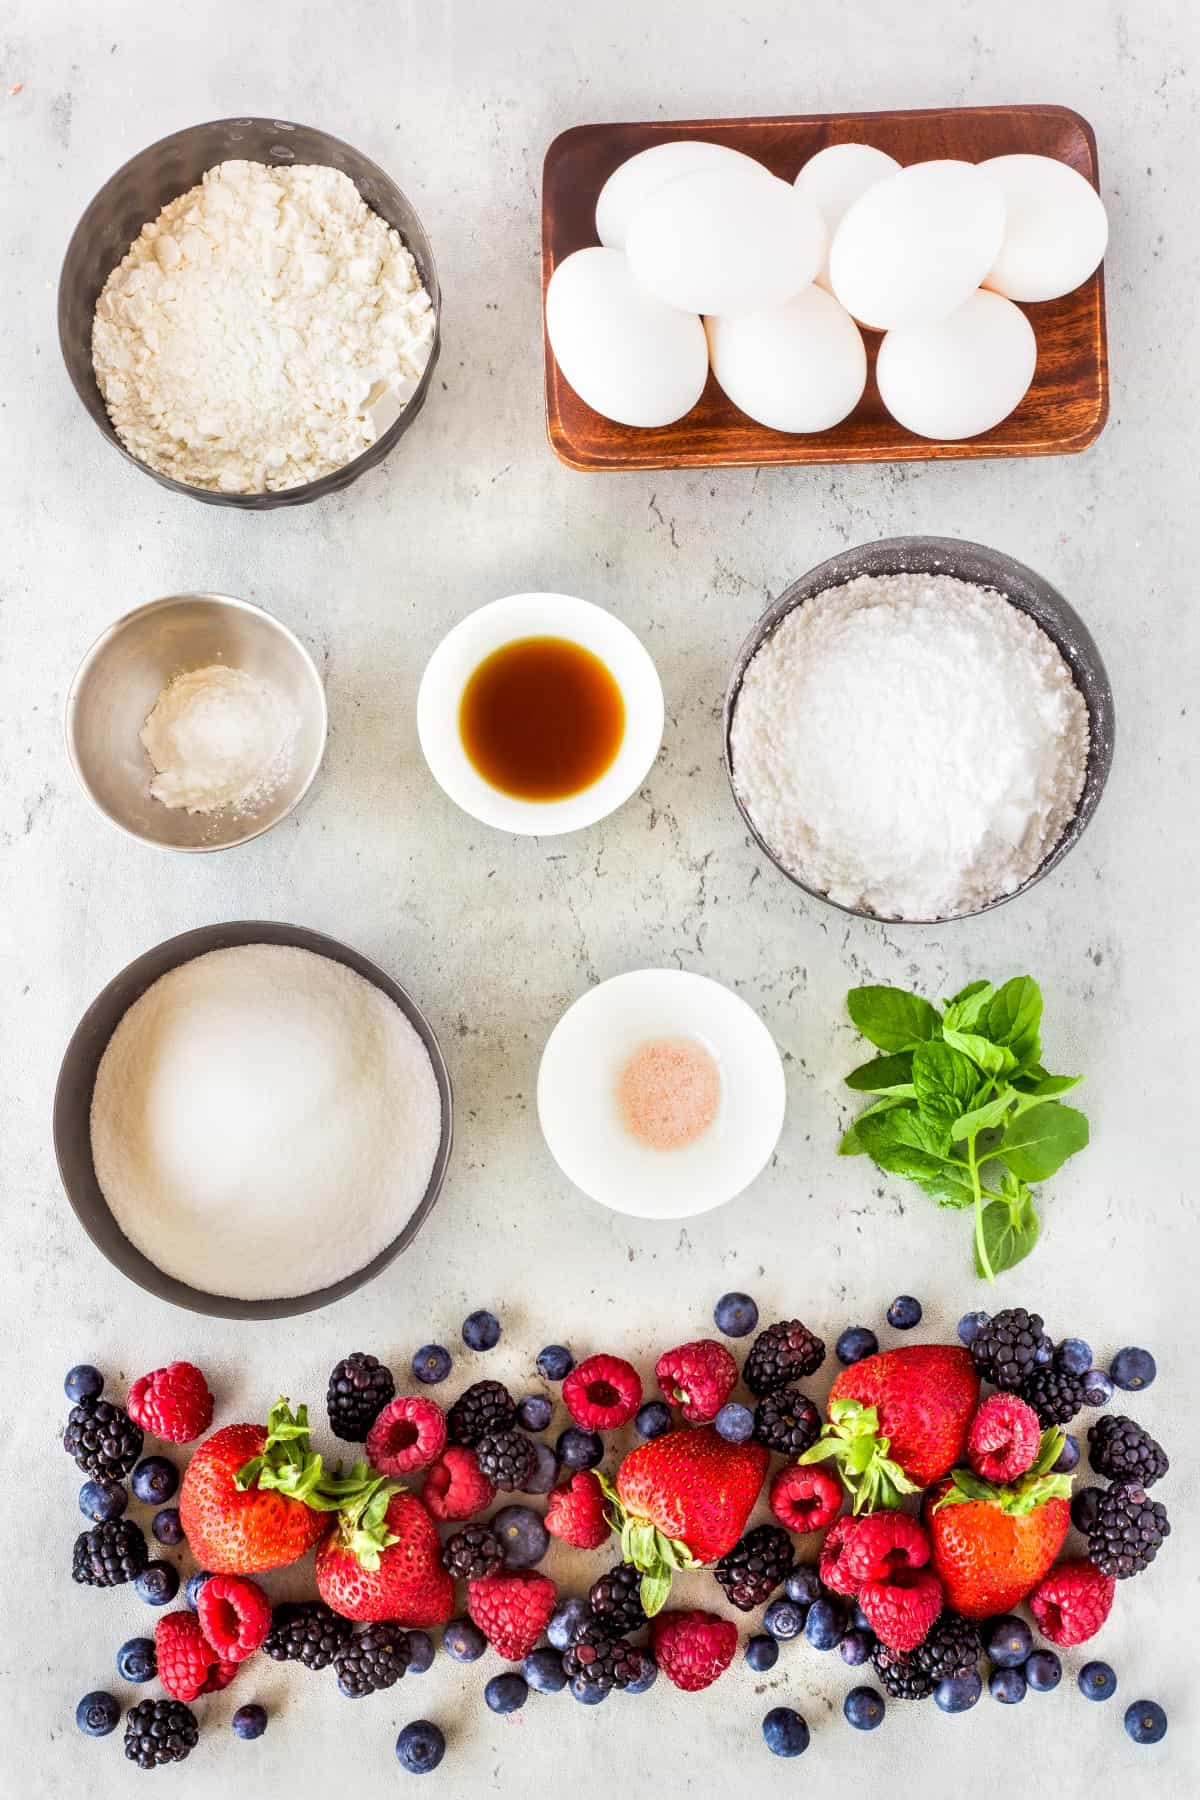 Ingredients for angel food cake